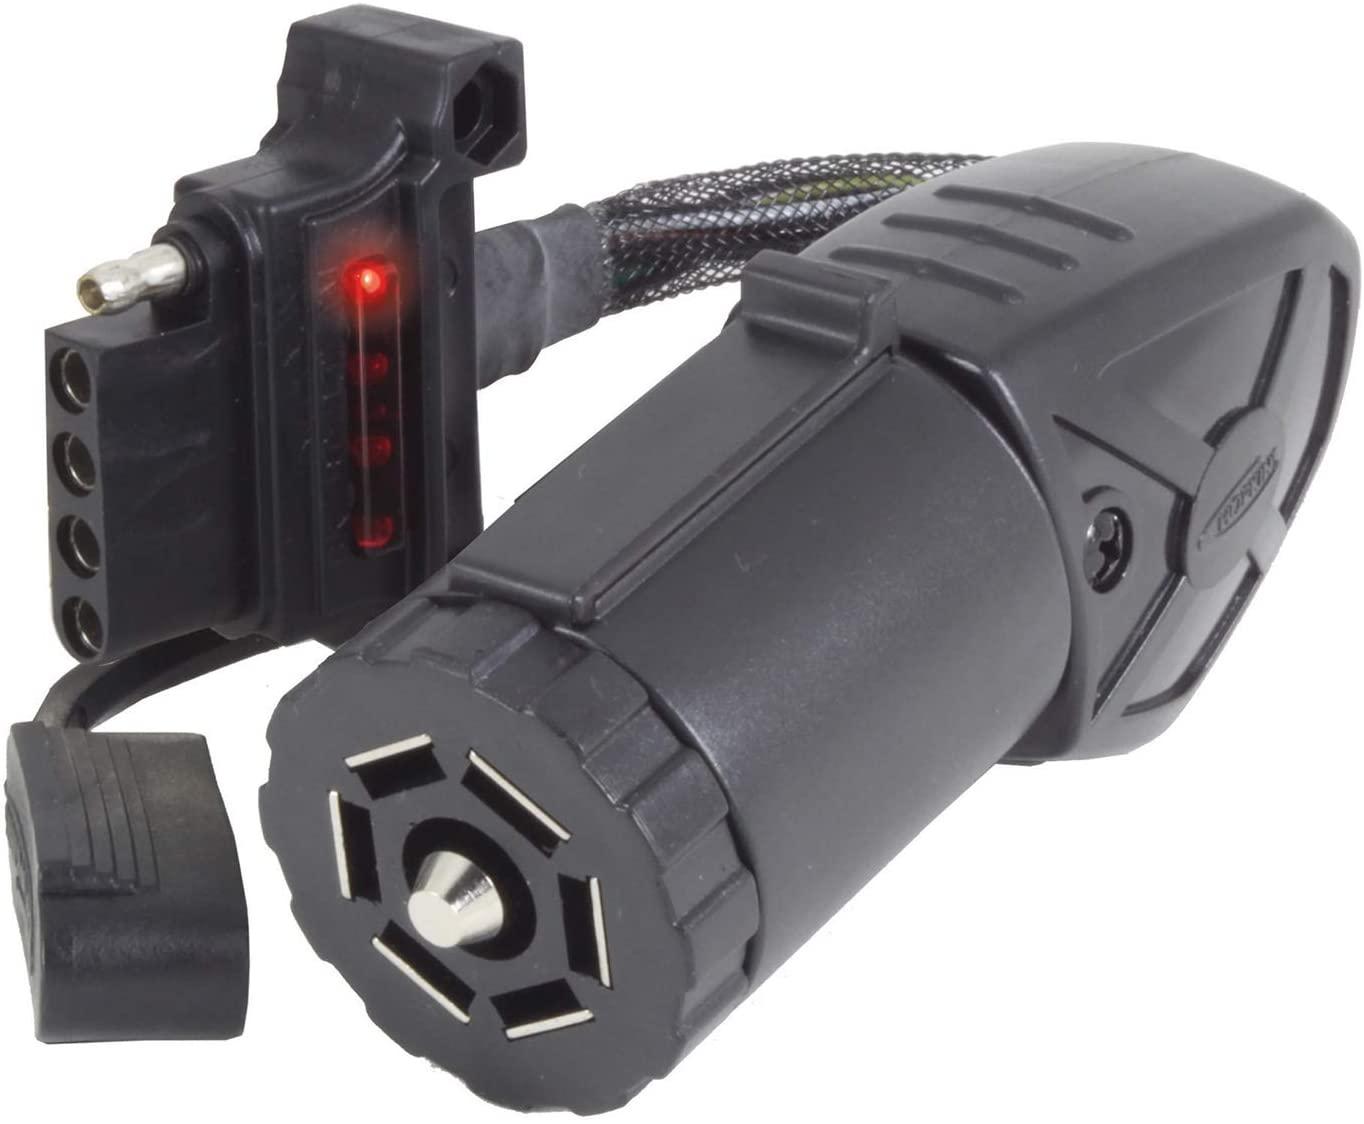 Hopkins 47390 Endurance 7 RV Blade to 5 Flat LED Flex Adapter